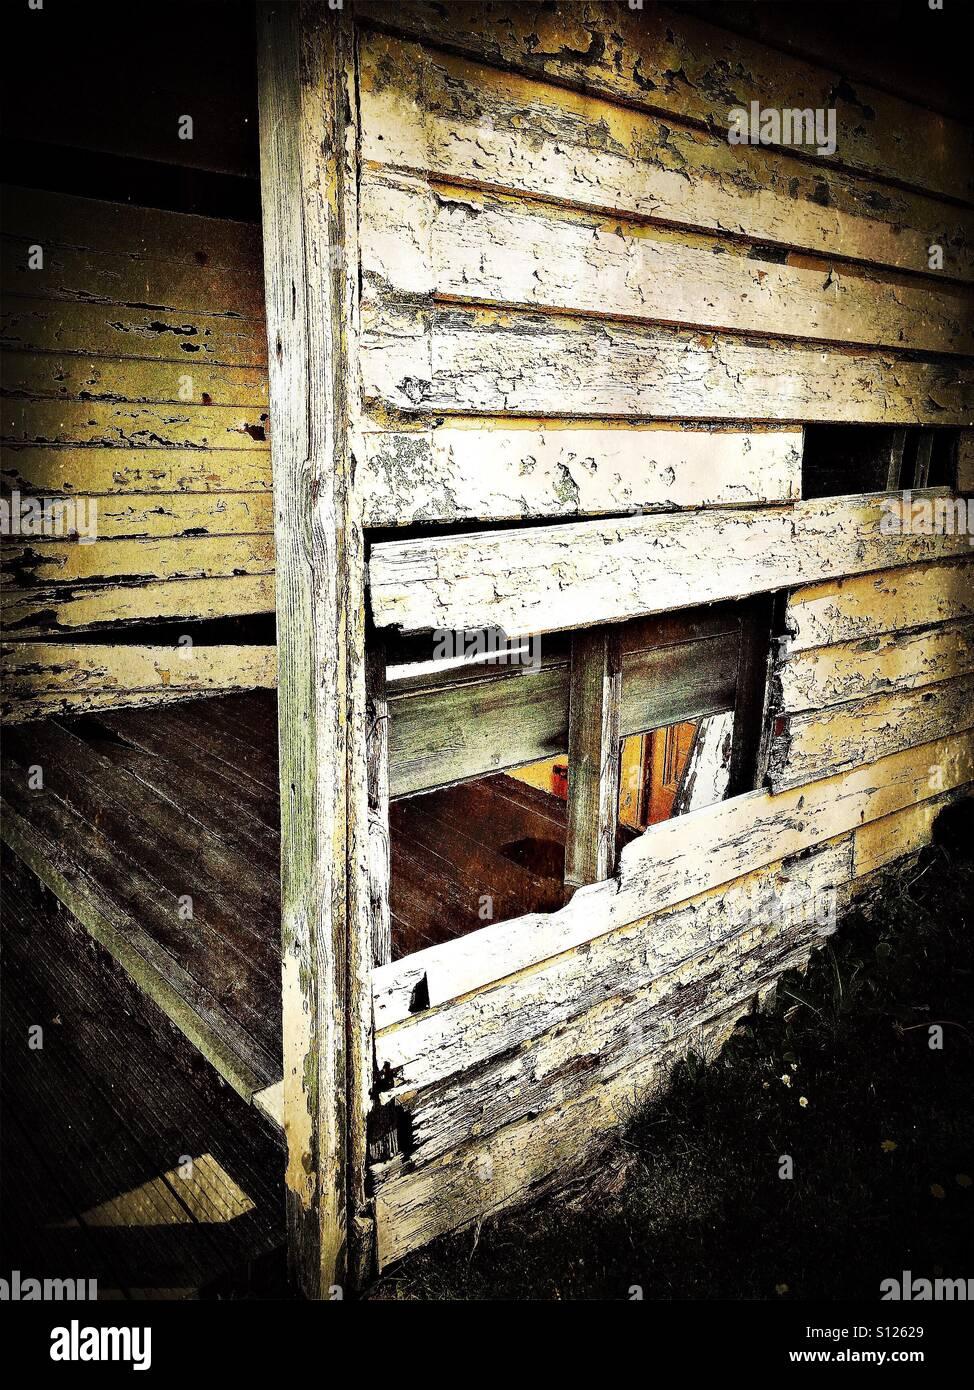 Old dilapidated beach hut - Stock Image